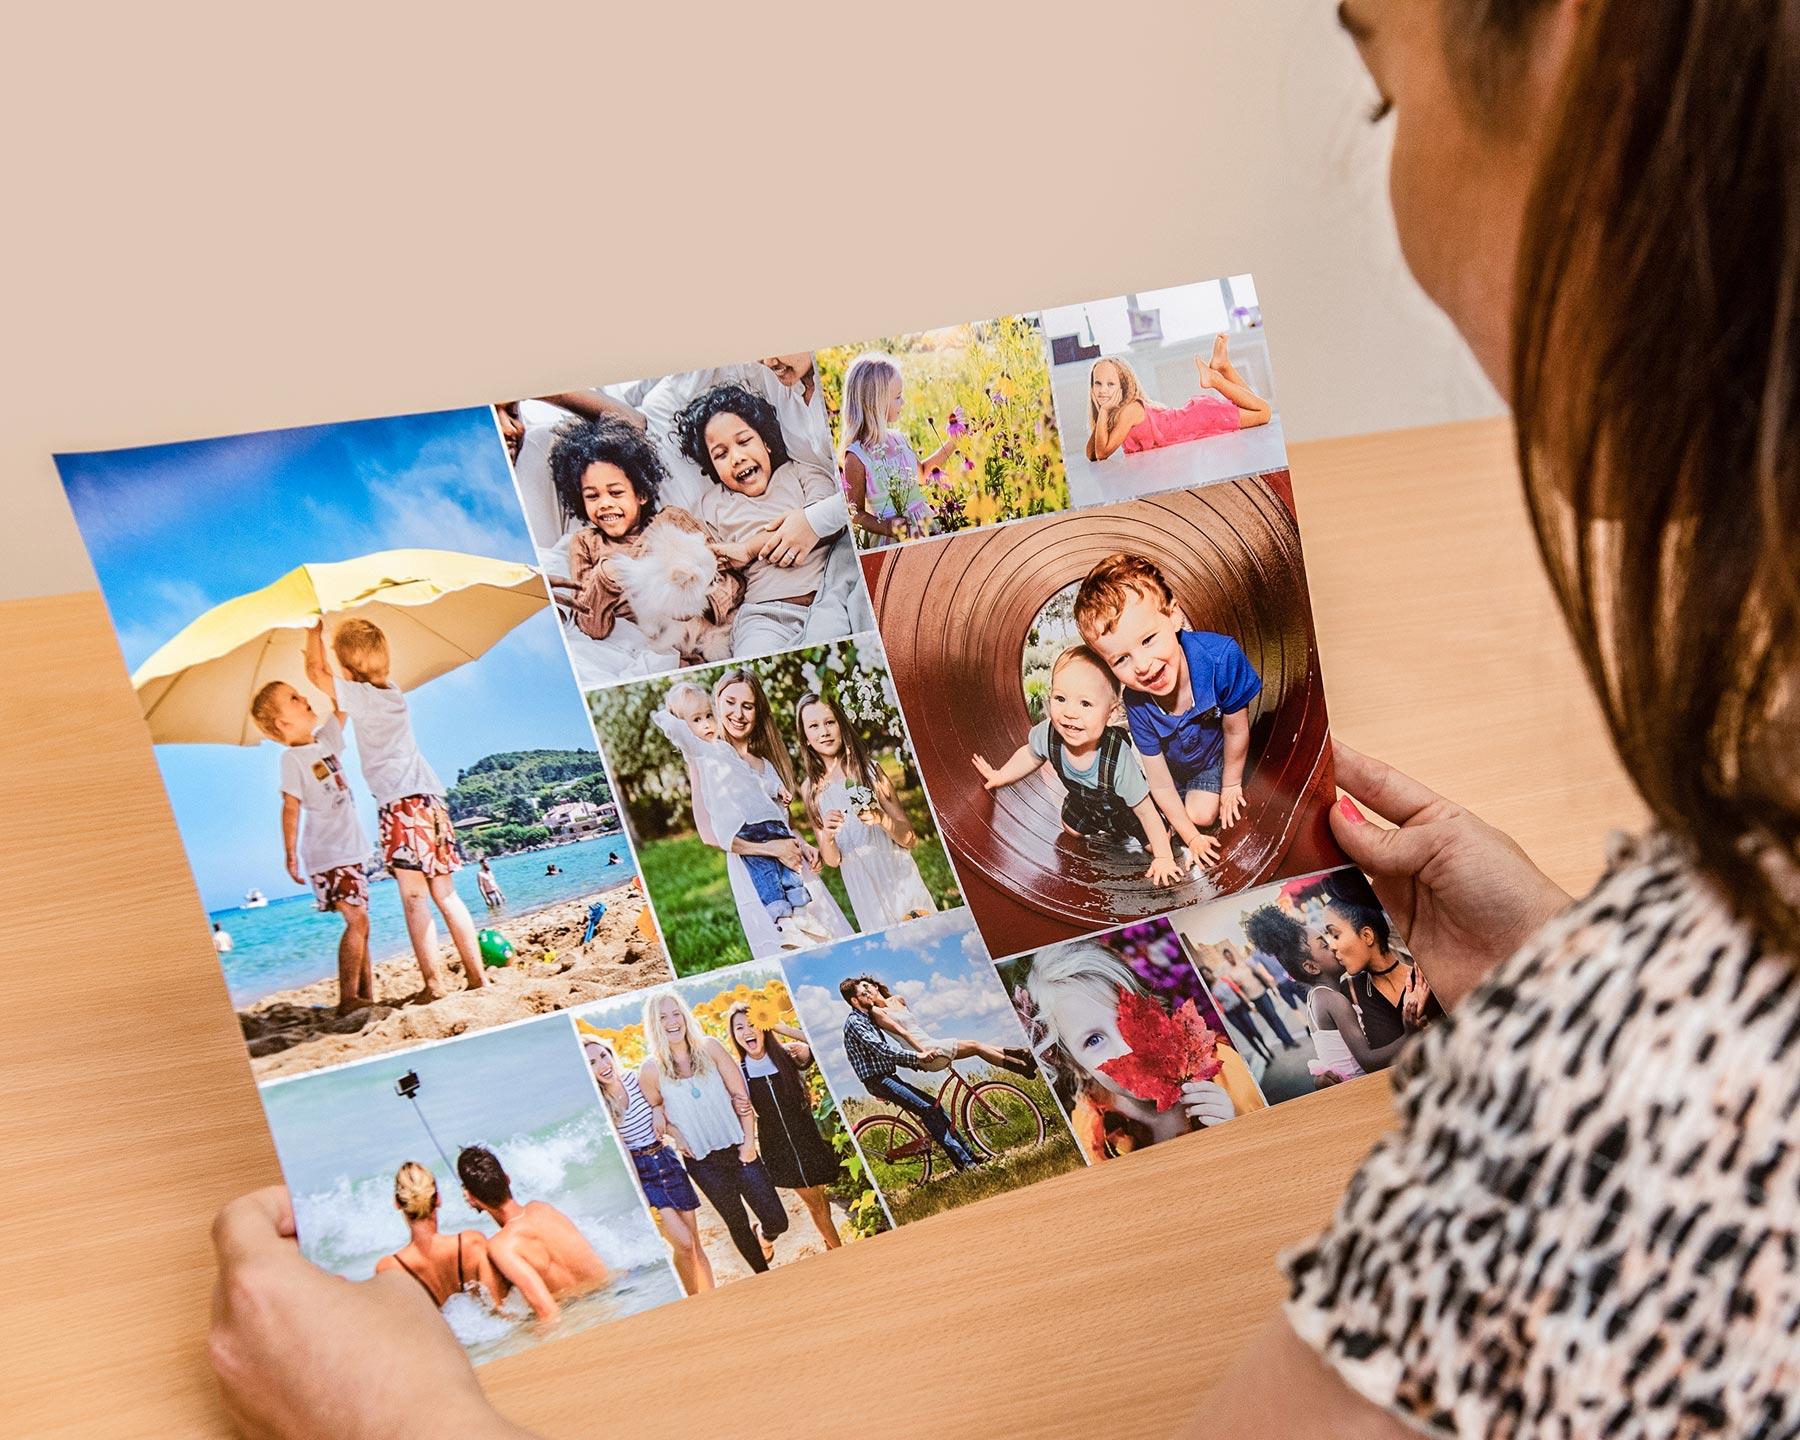 Admiring-Printed-Photo-Collage